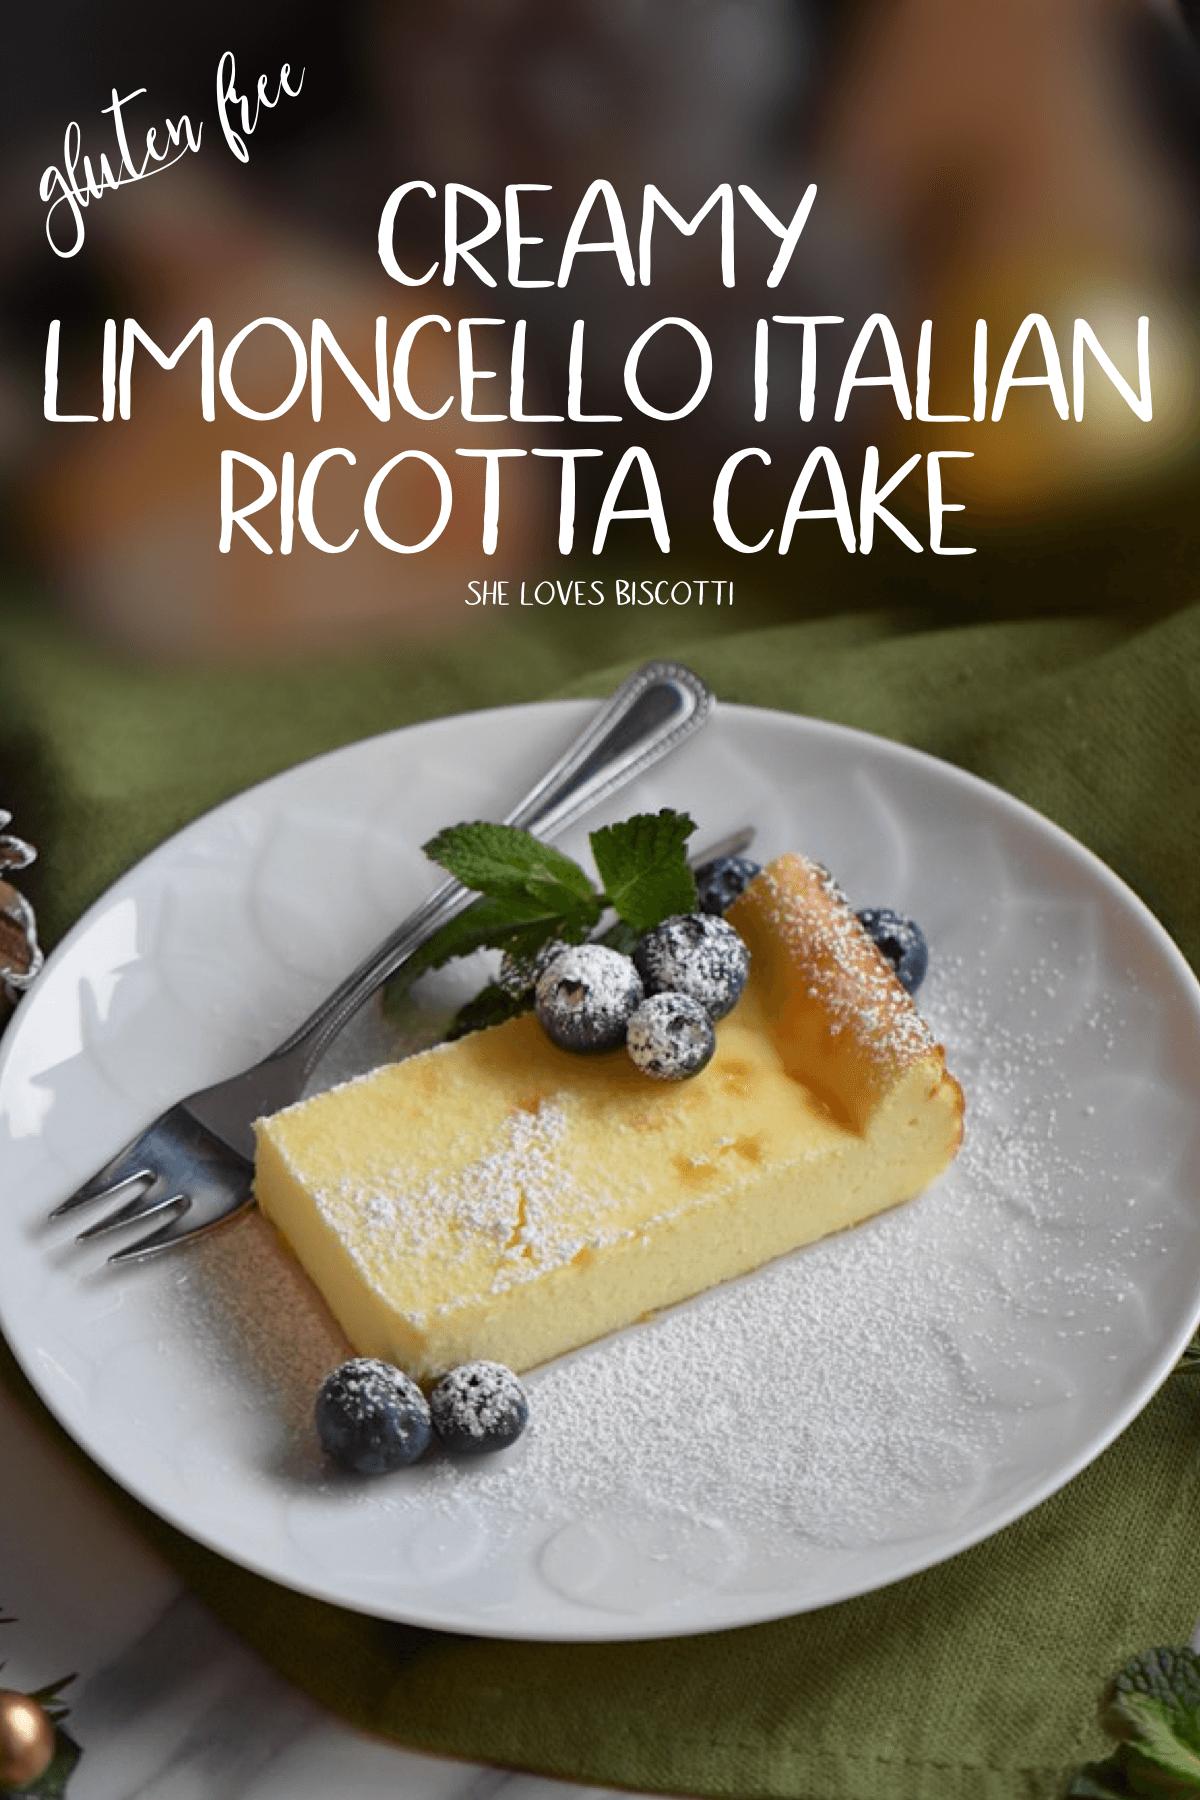 Creamy Limoncello Italian Ricotta Cake Recipe    Easy Italian Cake Recipe    Simple Italian Ricotta Cake #ricottacake #limoncello #Italianricottacake #Italiancake #ricotta #CreamyItaliancake #glutenfreecake #flourlesscake